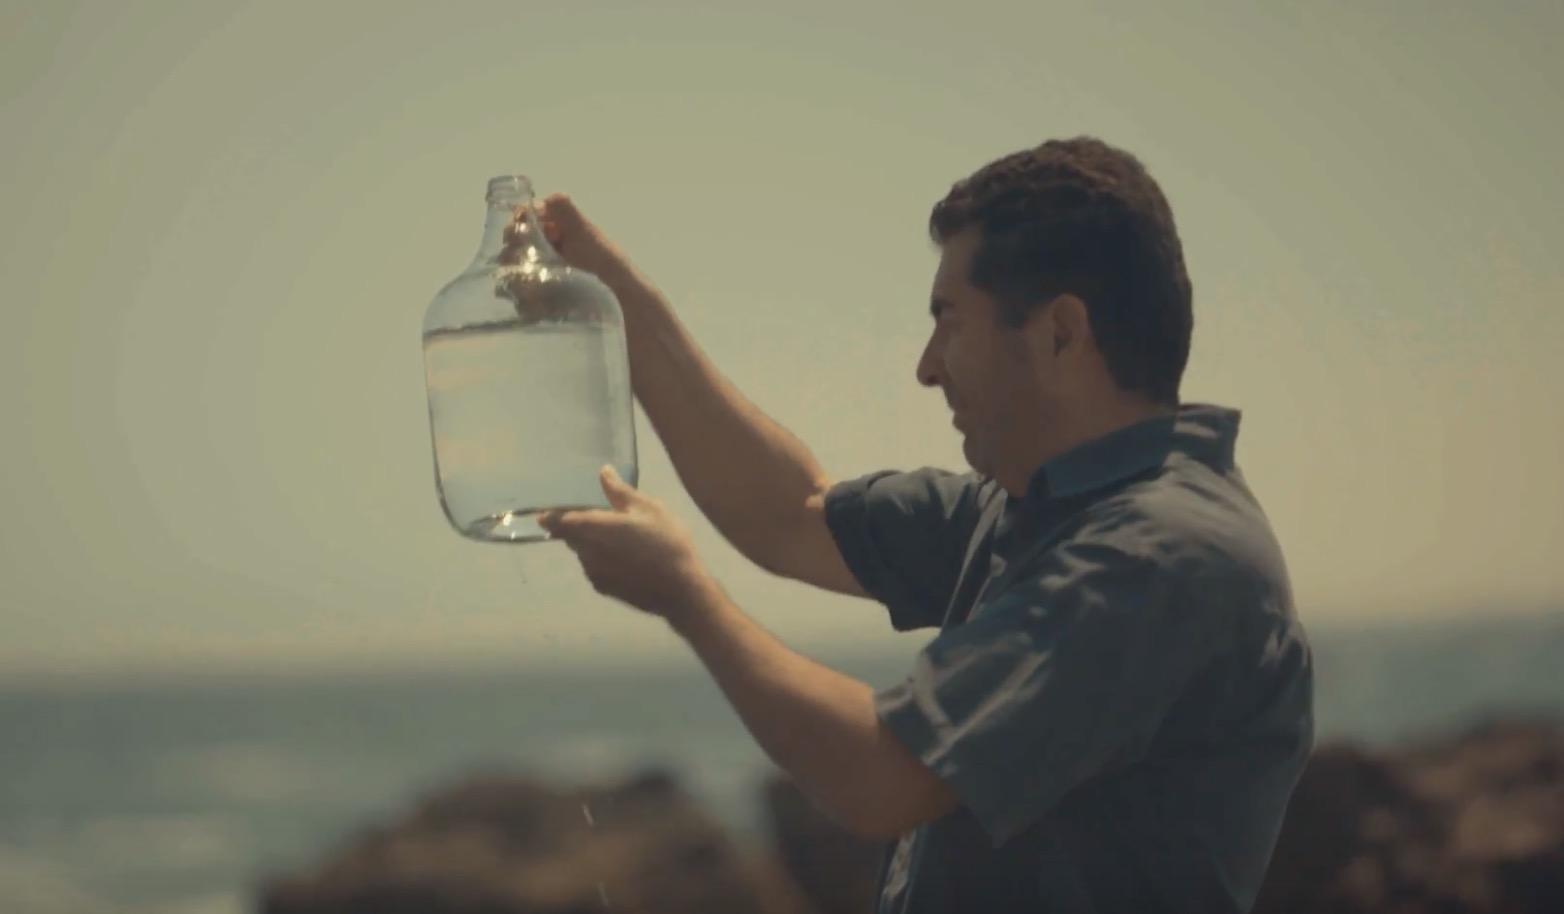 Crean cerveza artesanal boliviana con agua de mar de Antofagasta